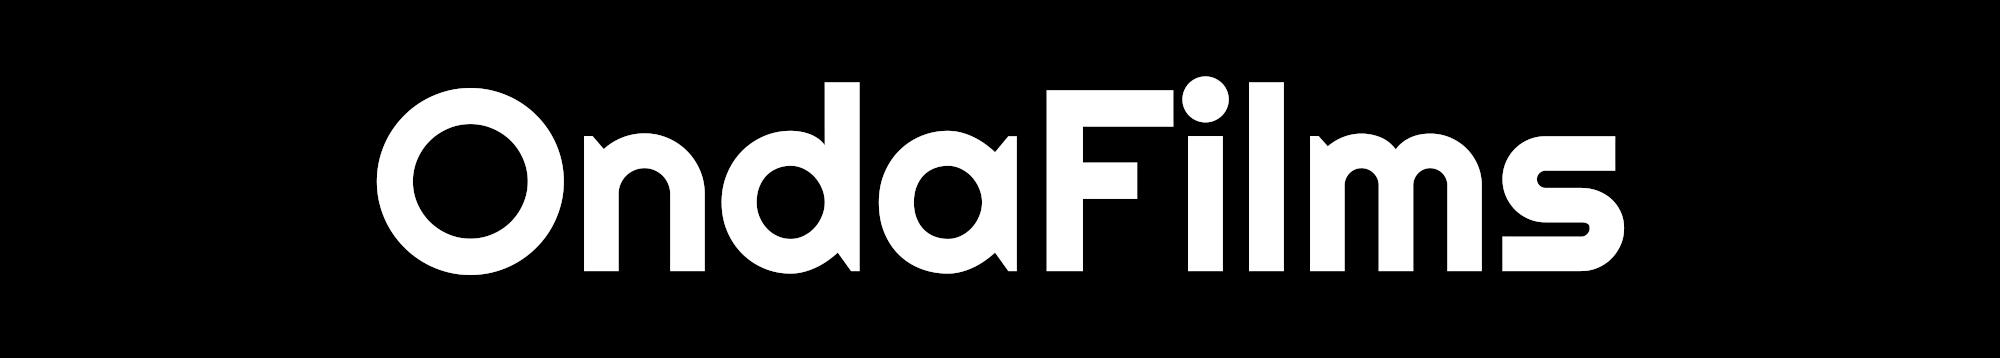 OndaFilms